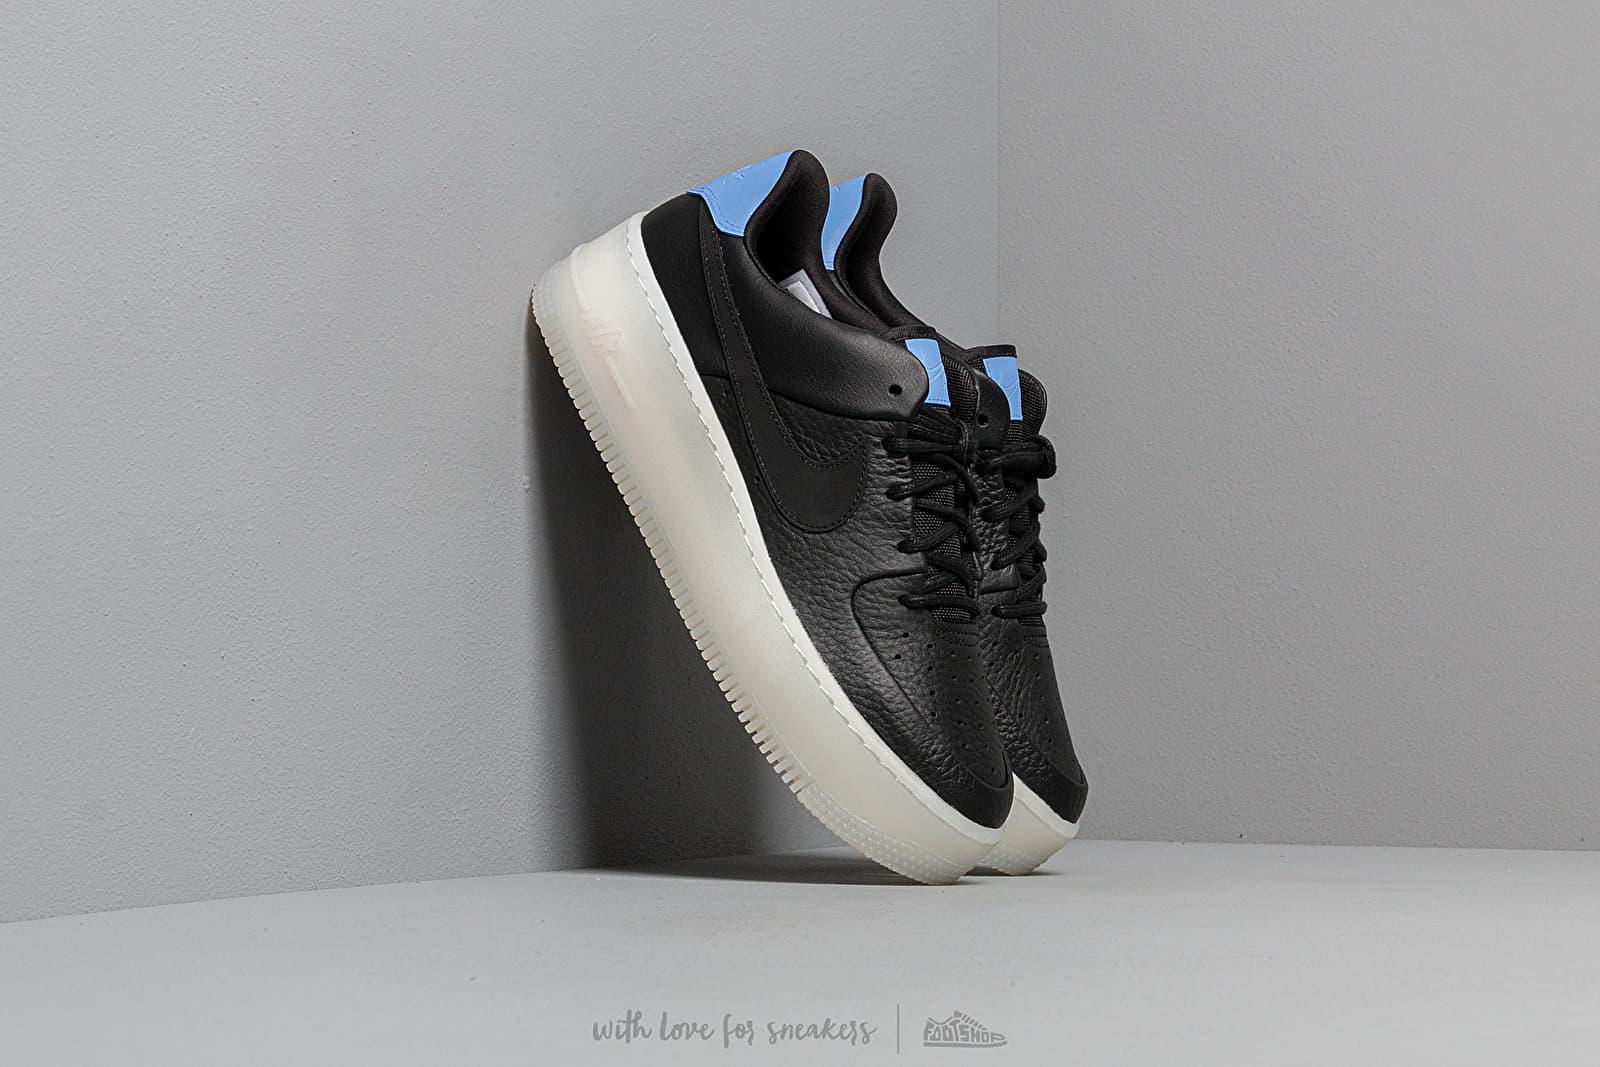 Nike W Air Force 1 Sage Low LX Black/ Royal Pulse za skvelú cenu 110 € kúpite na Footshop.sk